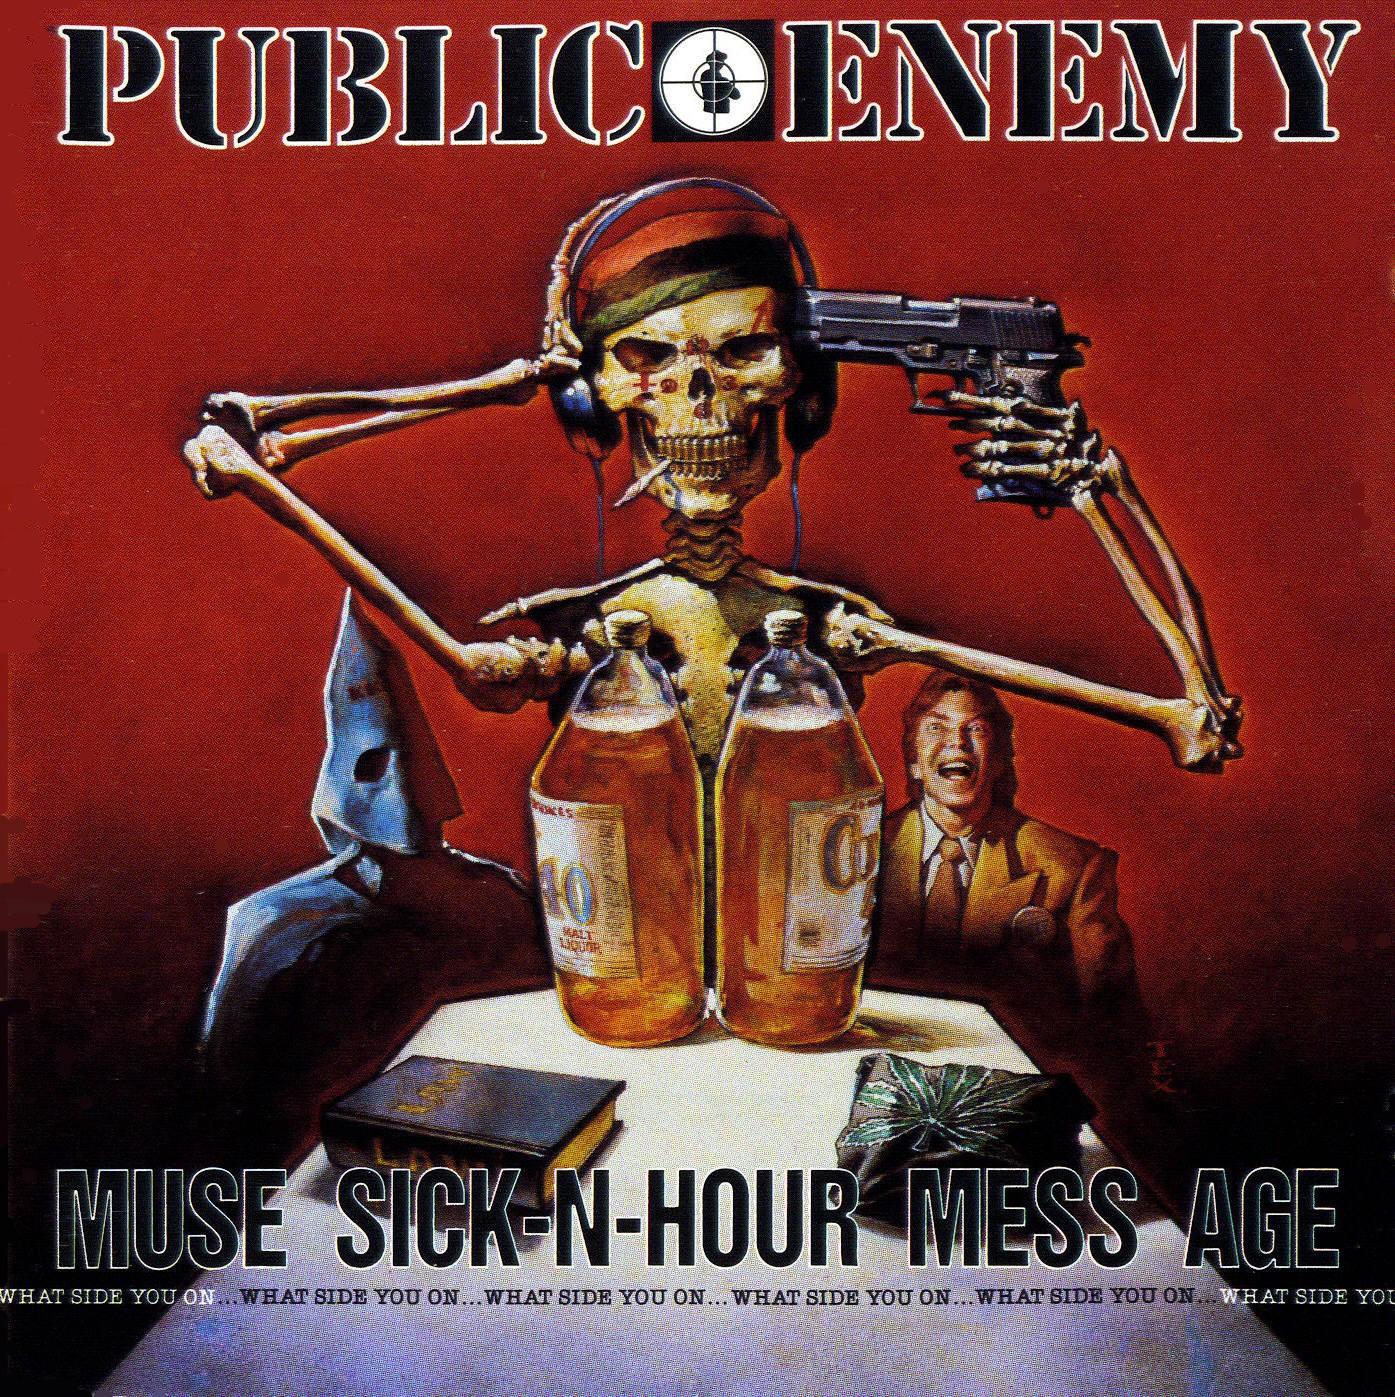 public_enemy_-_1994_muse_sick-n-hour_mess_age.jpg